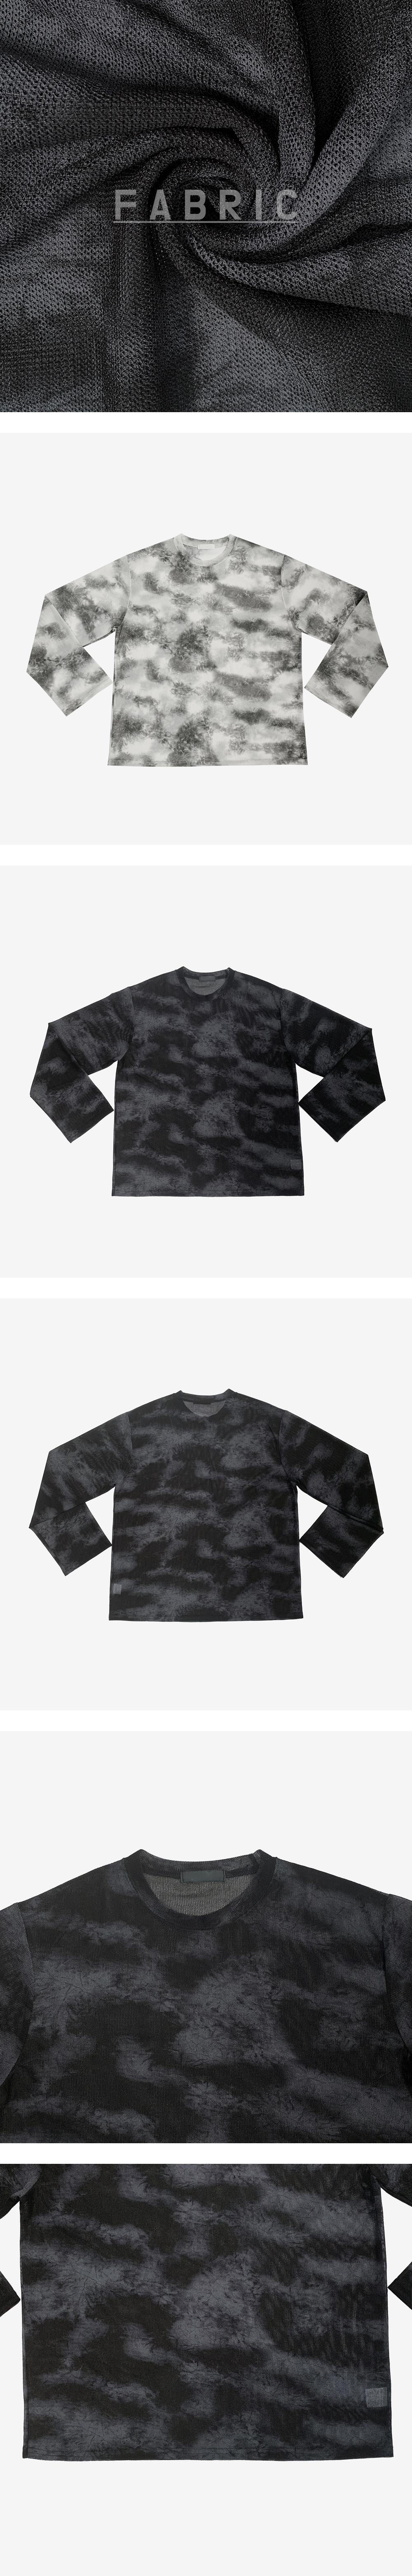 Kitz mesh T-shirt